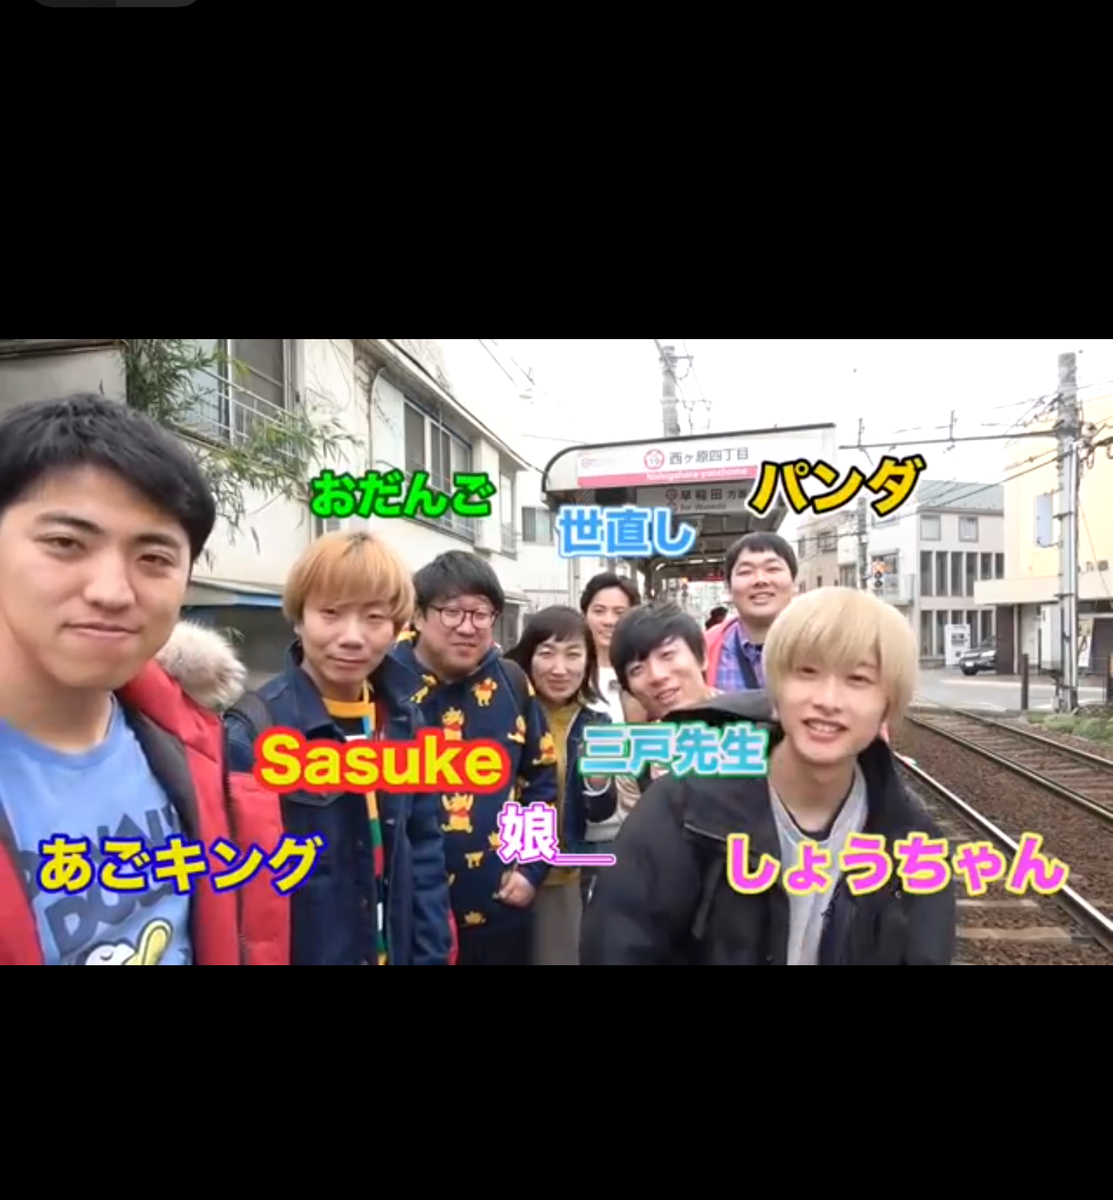 Sasuke チャンネル プリッ と